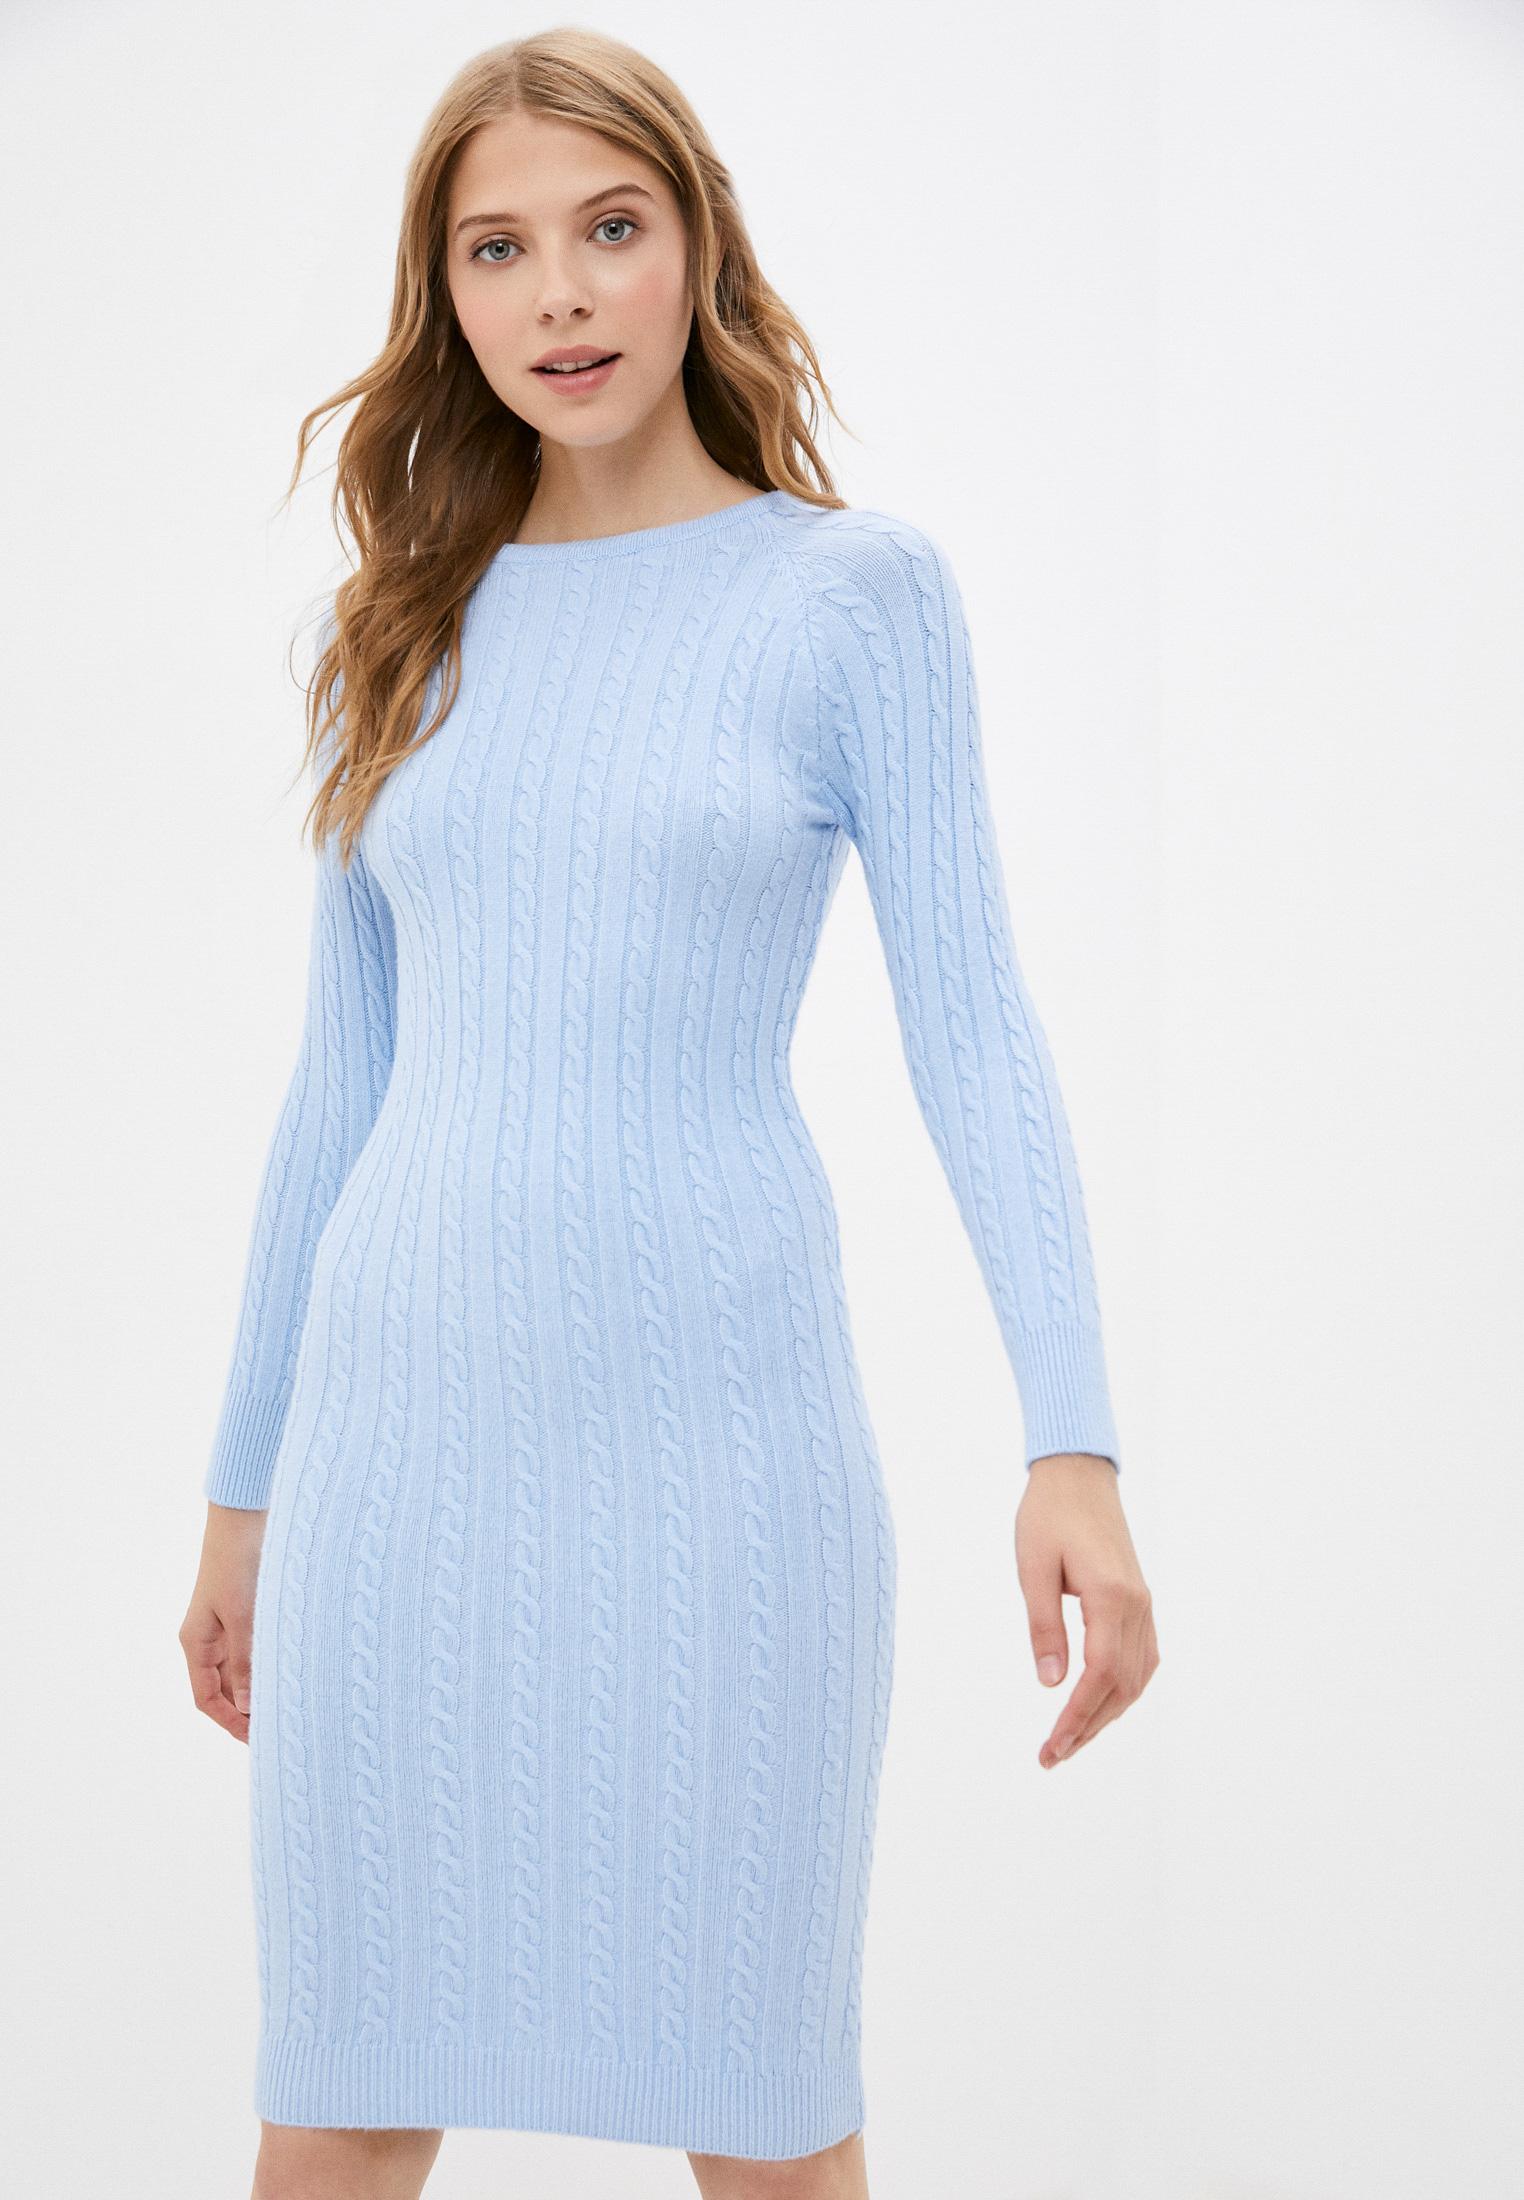 Вязаное платье Vickwool VW271-3